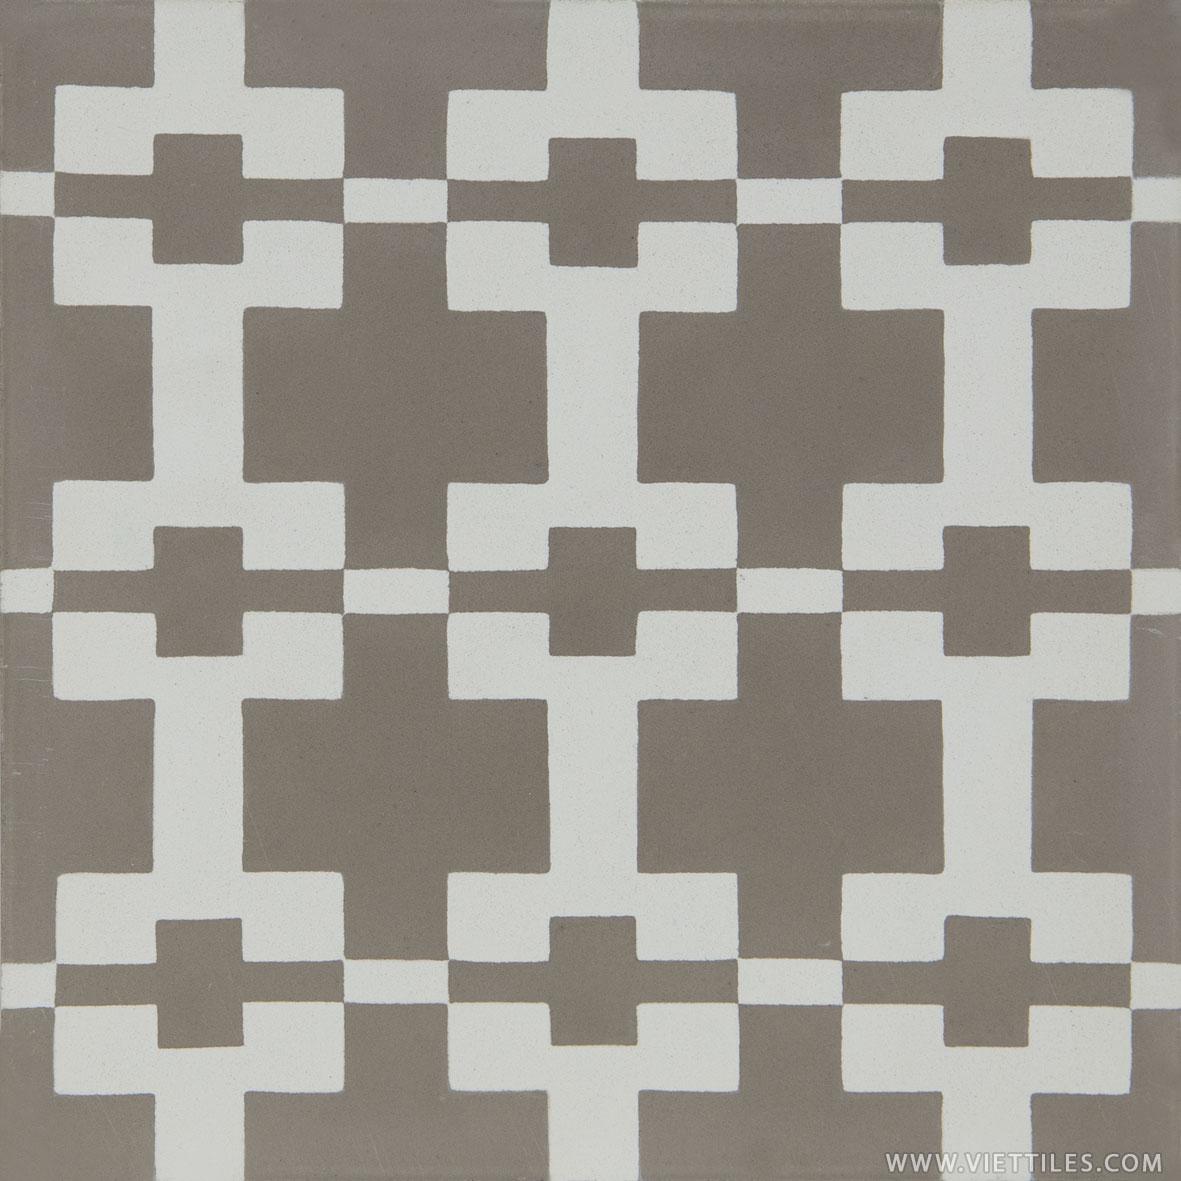 V20-690-T-02 Cement tile